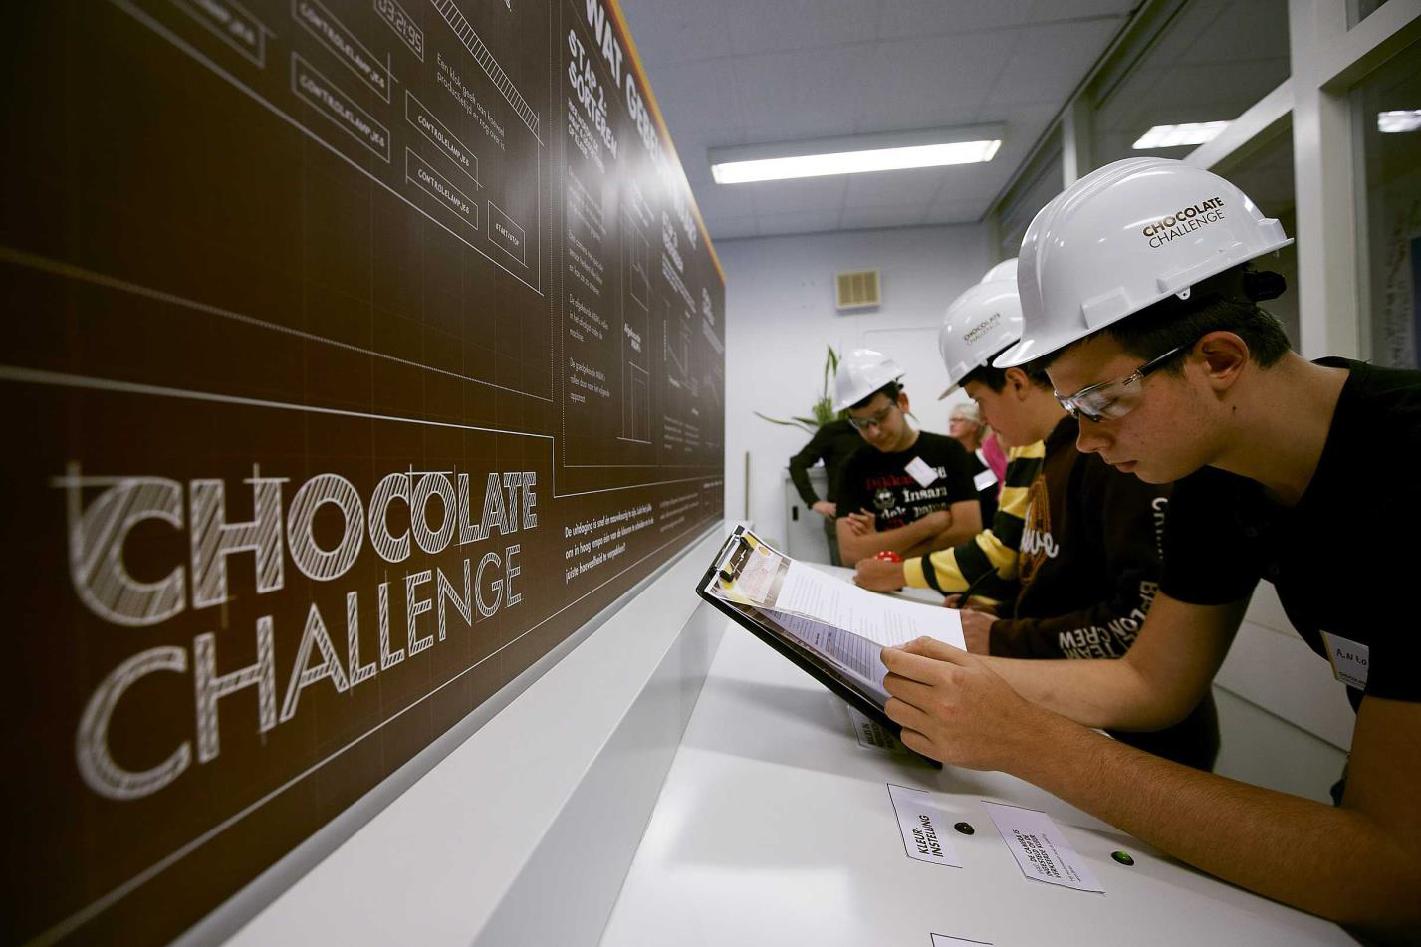 Chocolate Challenge_Pagina_12_Afbeelding_0001